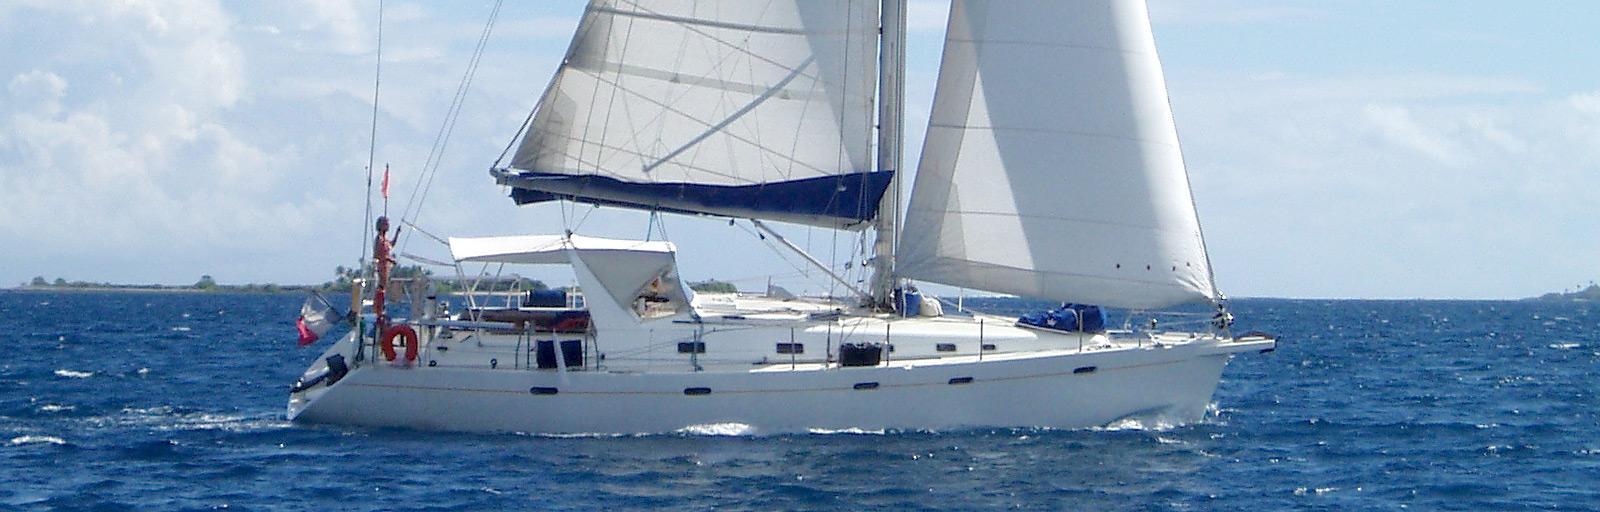 Universall Yachting 49.9 - AYC Yachtbroker